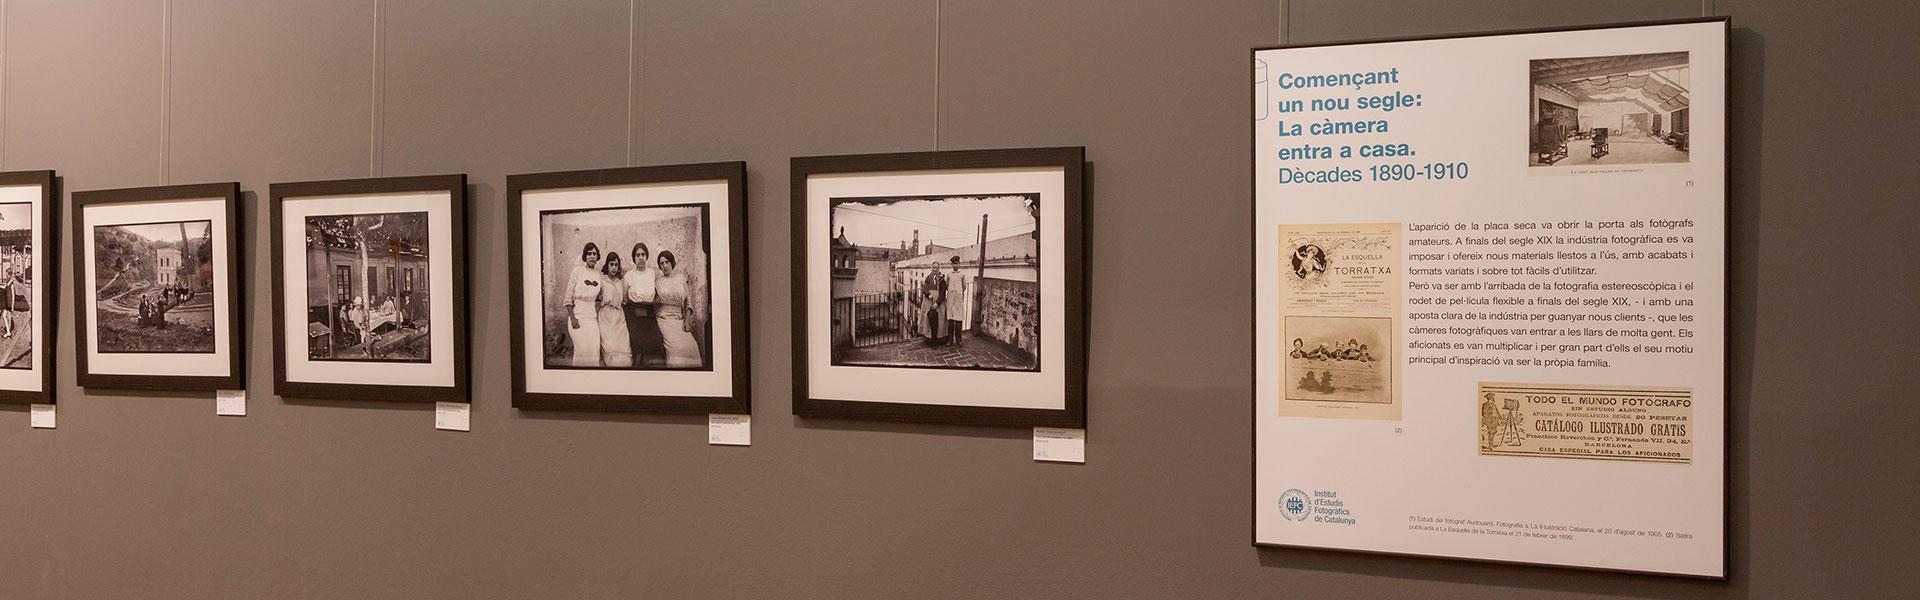 El Museu Palau Mercader acoge la exposición Fotos en familia del Arxiu Històric Fotogràfic del IEFC